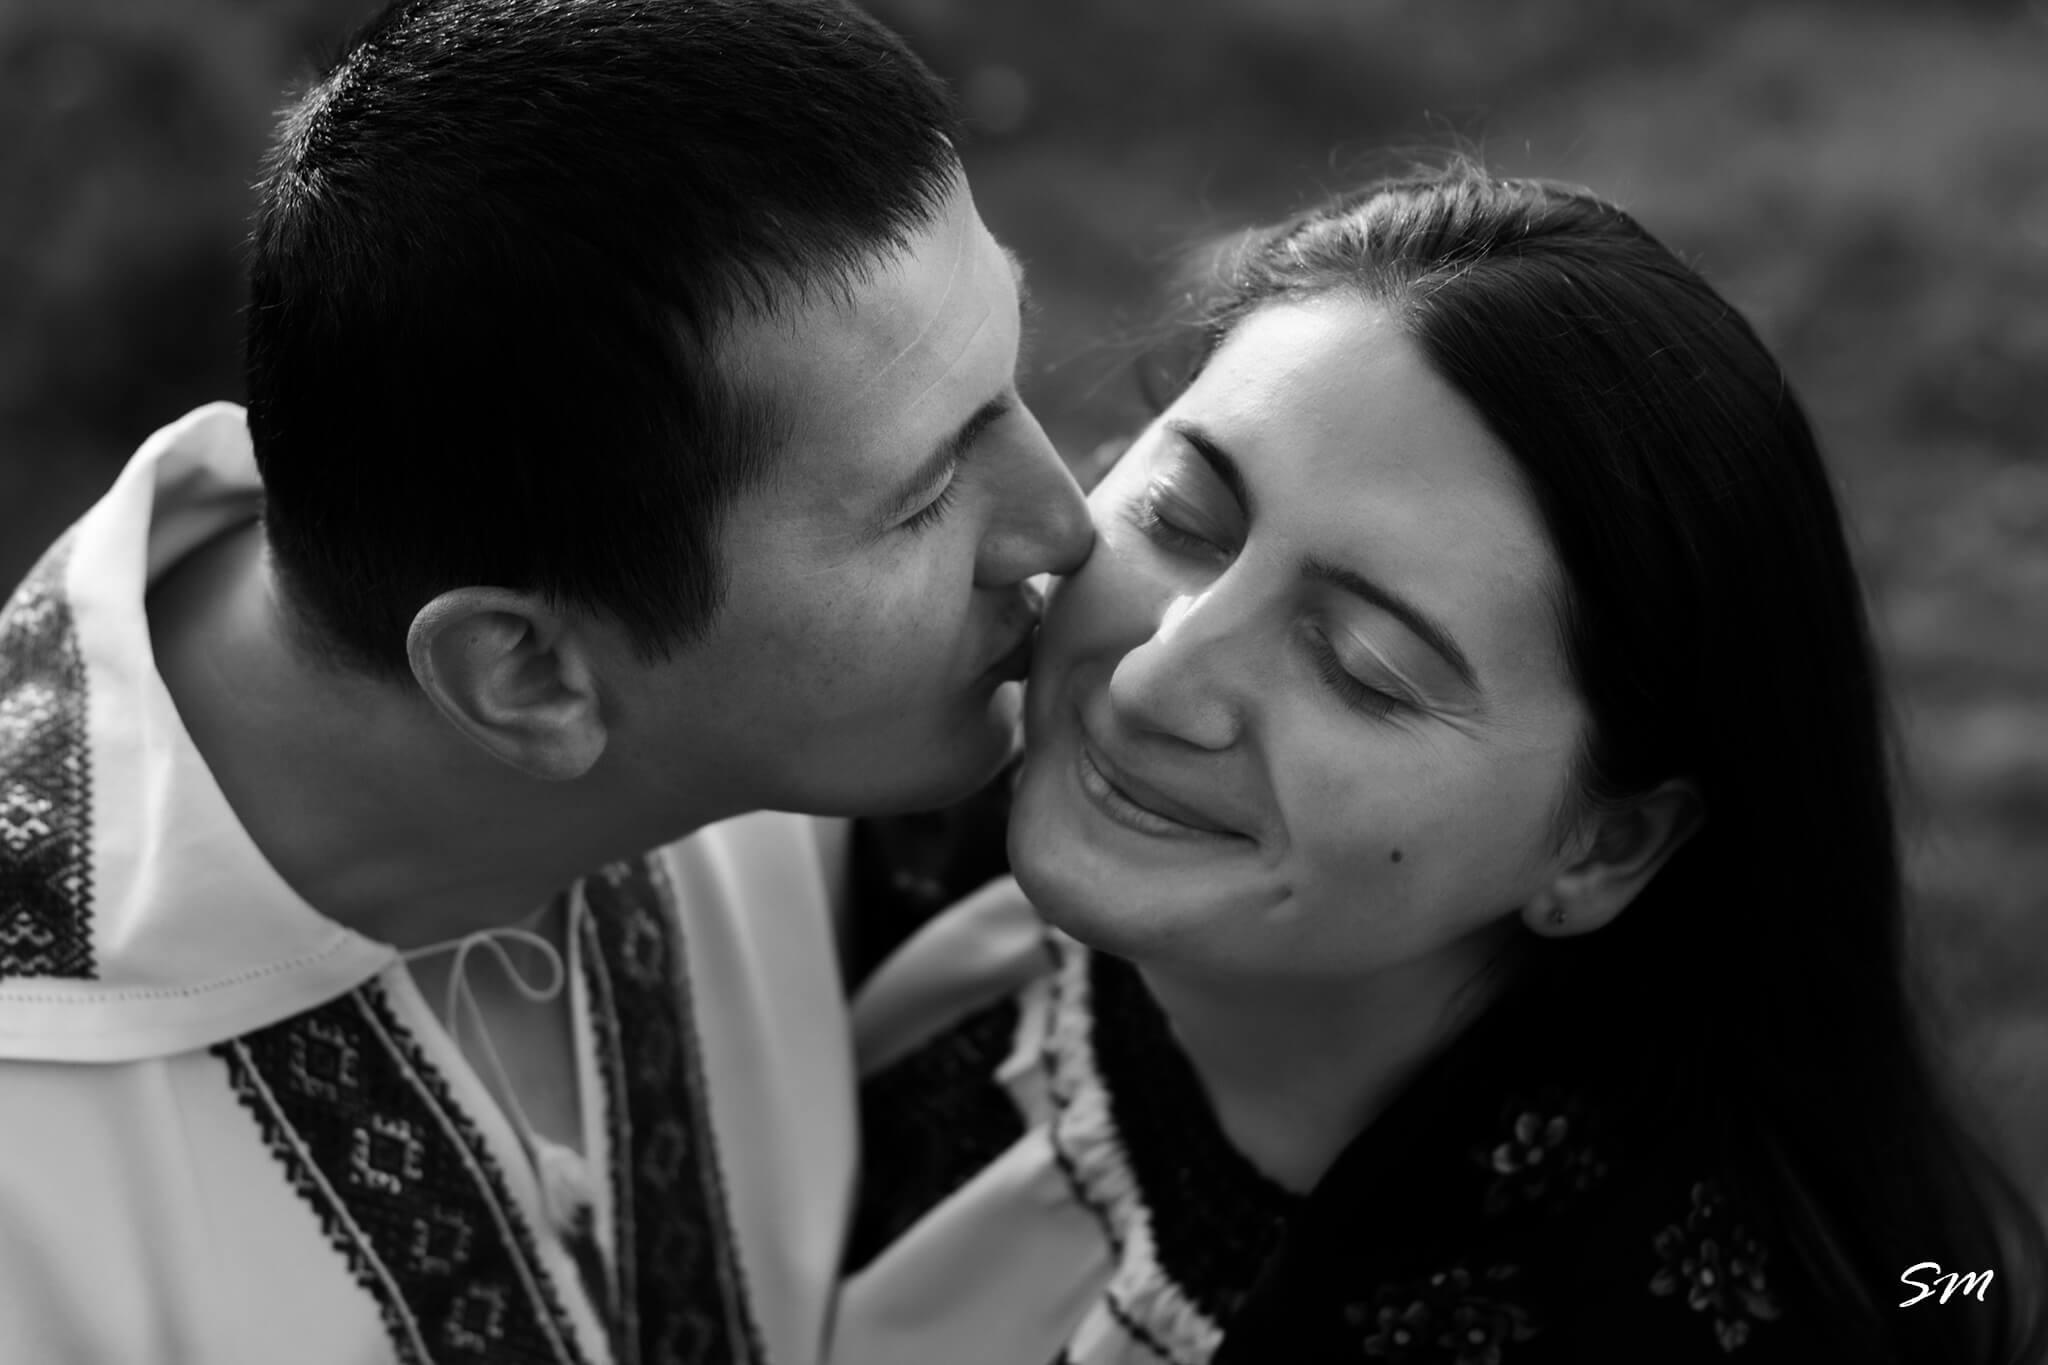 fotograf_nunta_profesionist_suceava (3)